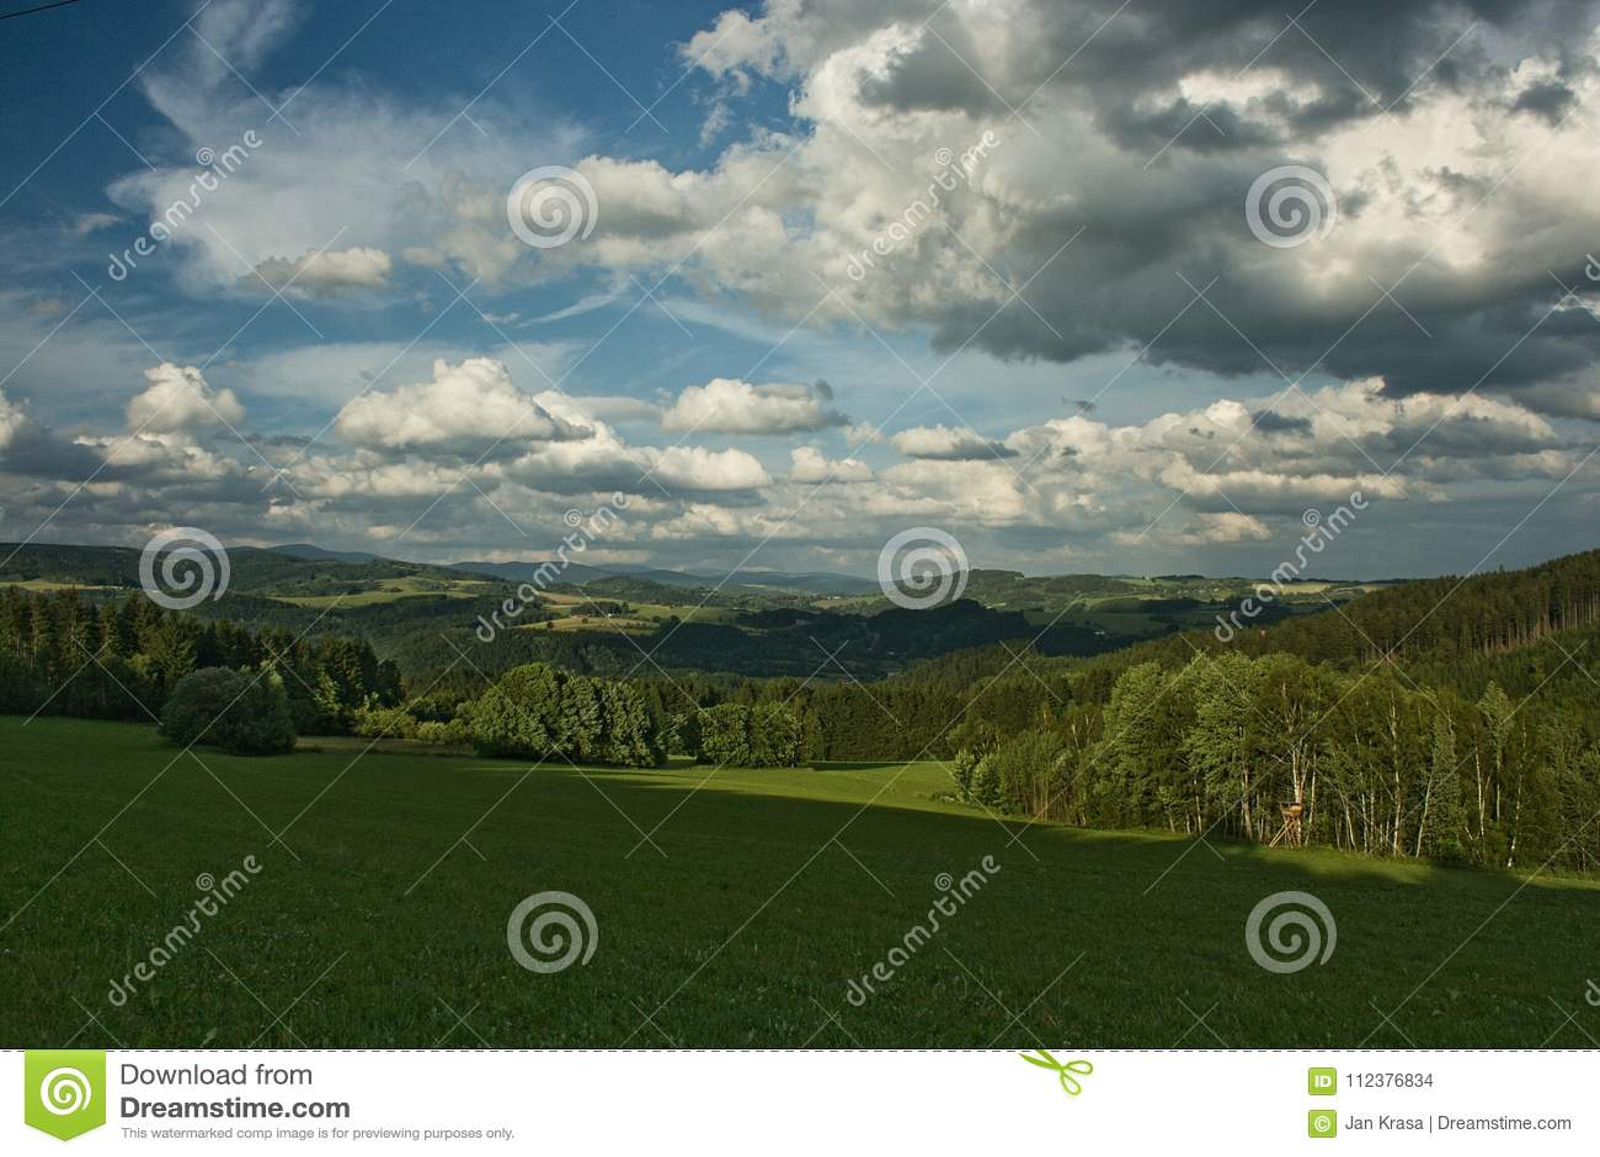 Чехия - Jablonec nad Nisou и окрестности